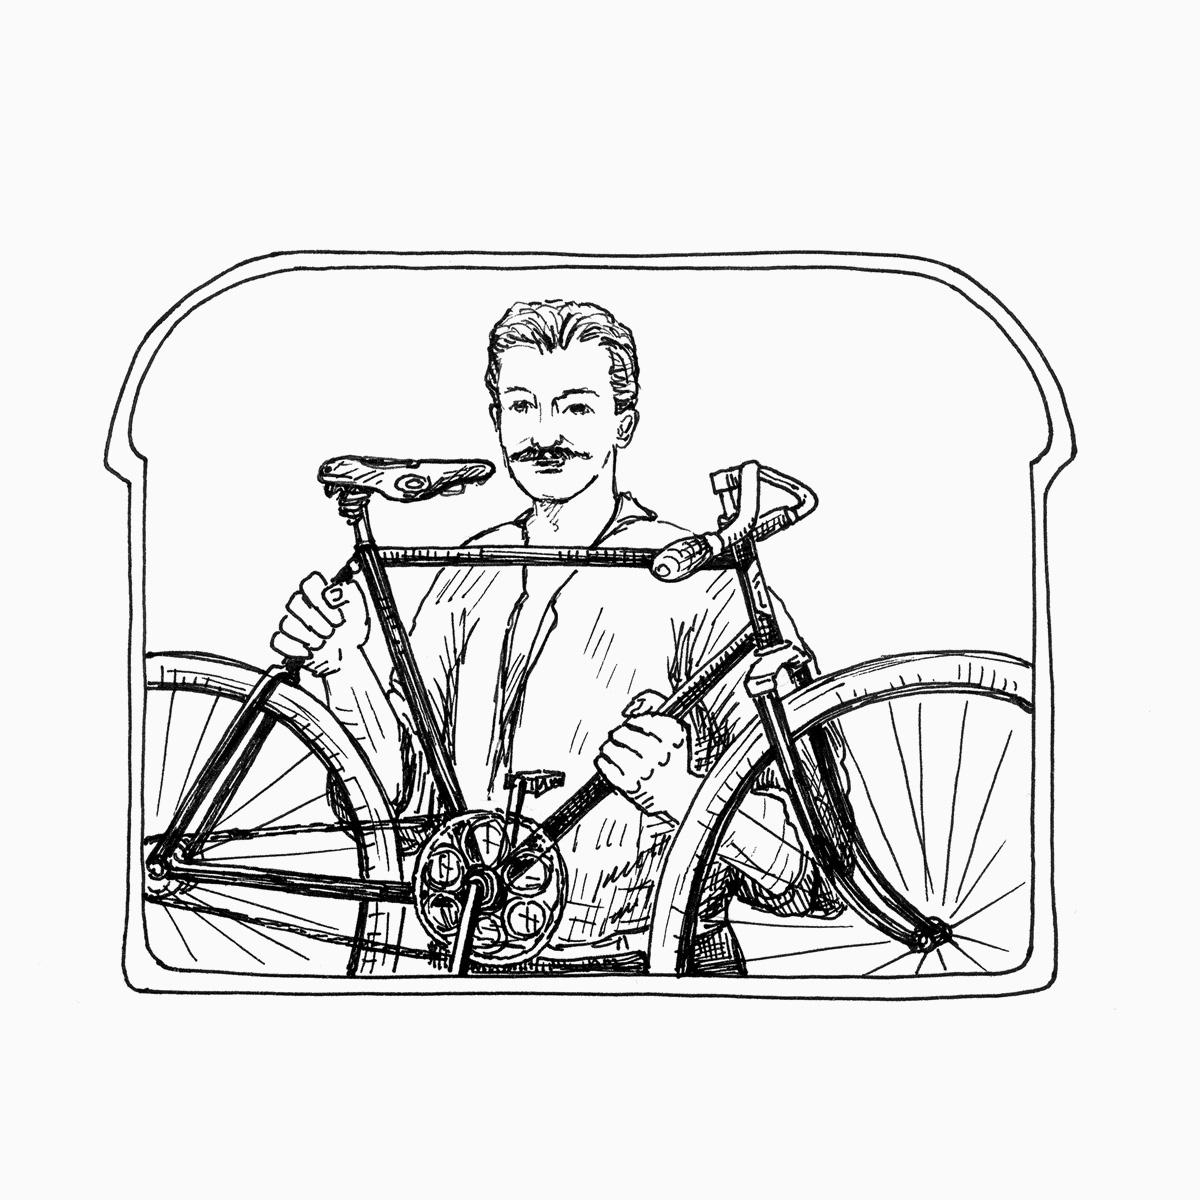 Fahrrad-Mechaniker bearbeitet einen Diamant-Rahmen